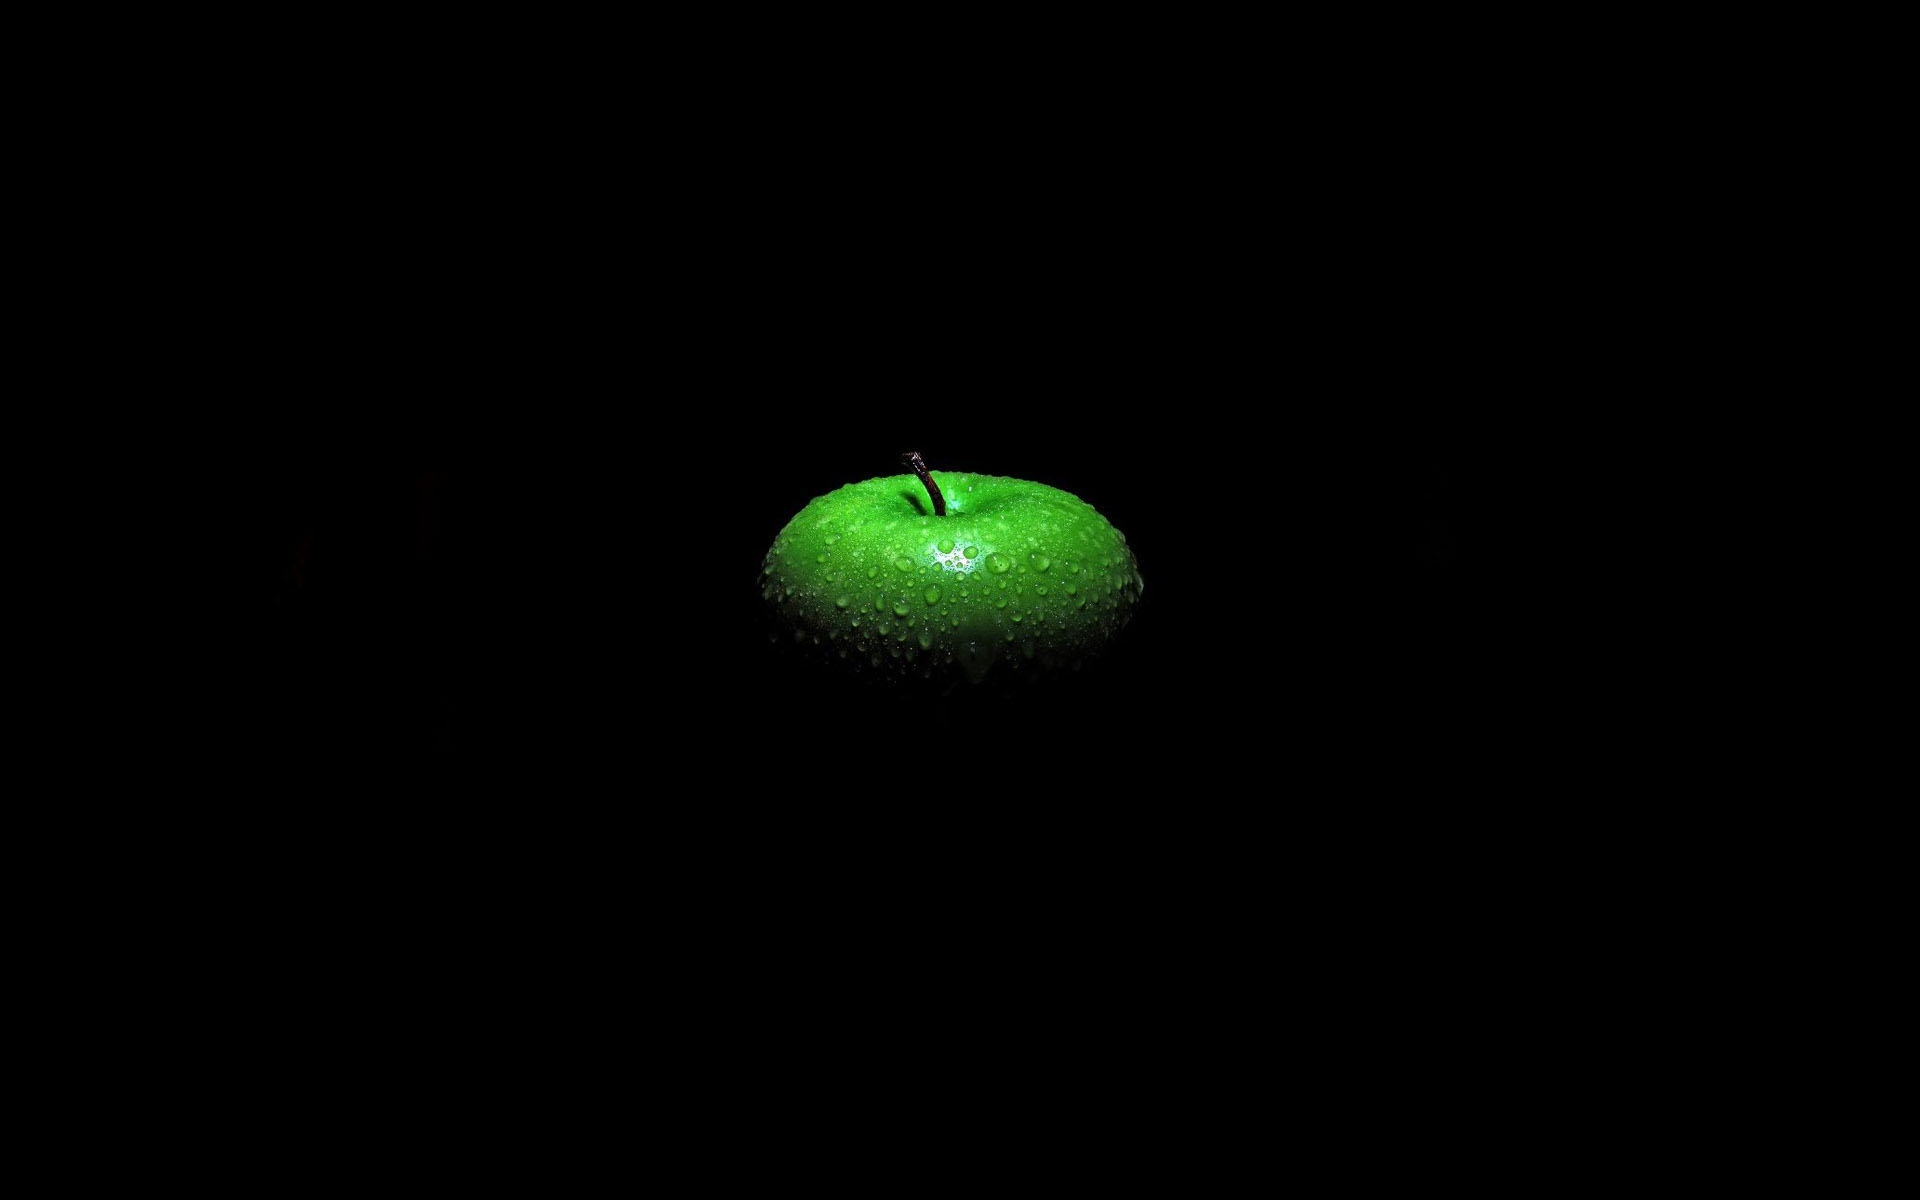 Green Apple Black Background Hd Wallpaper